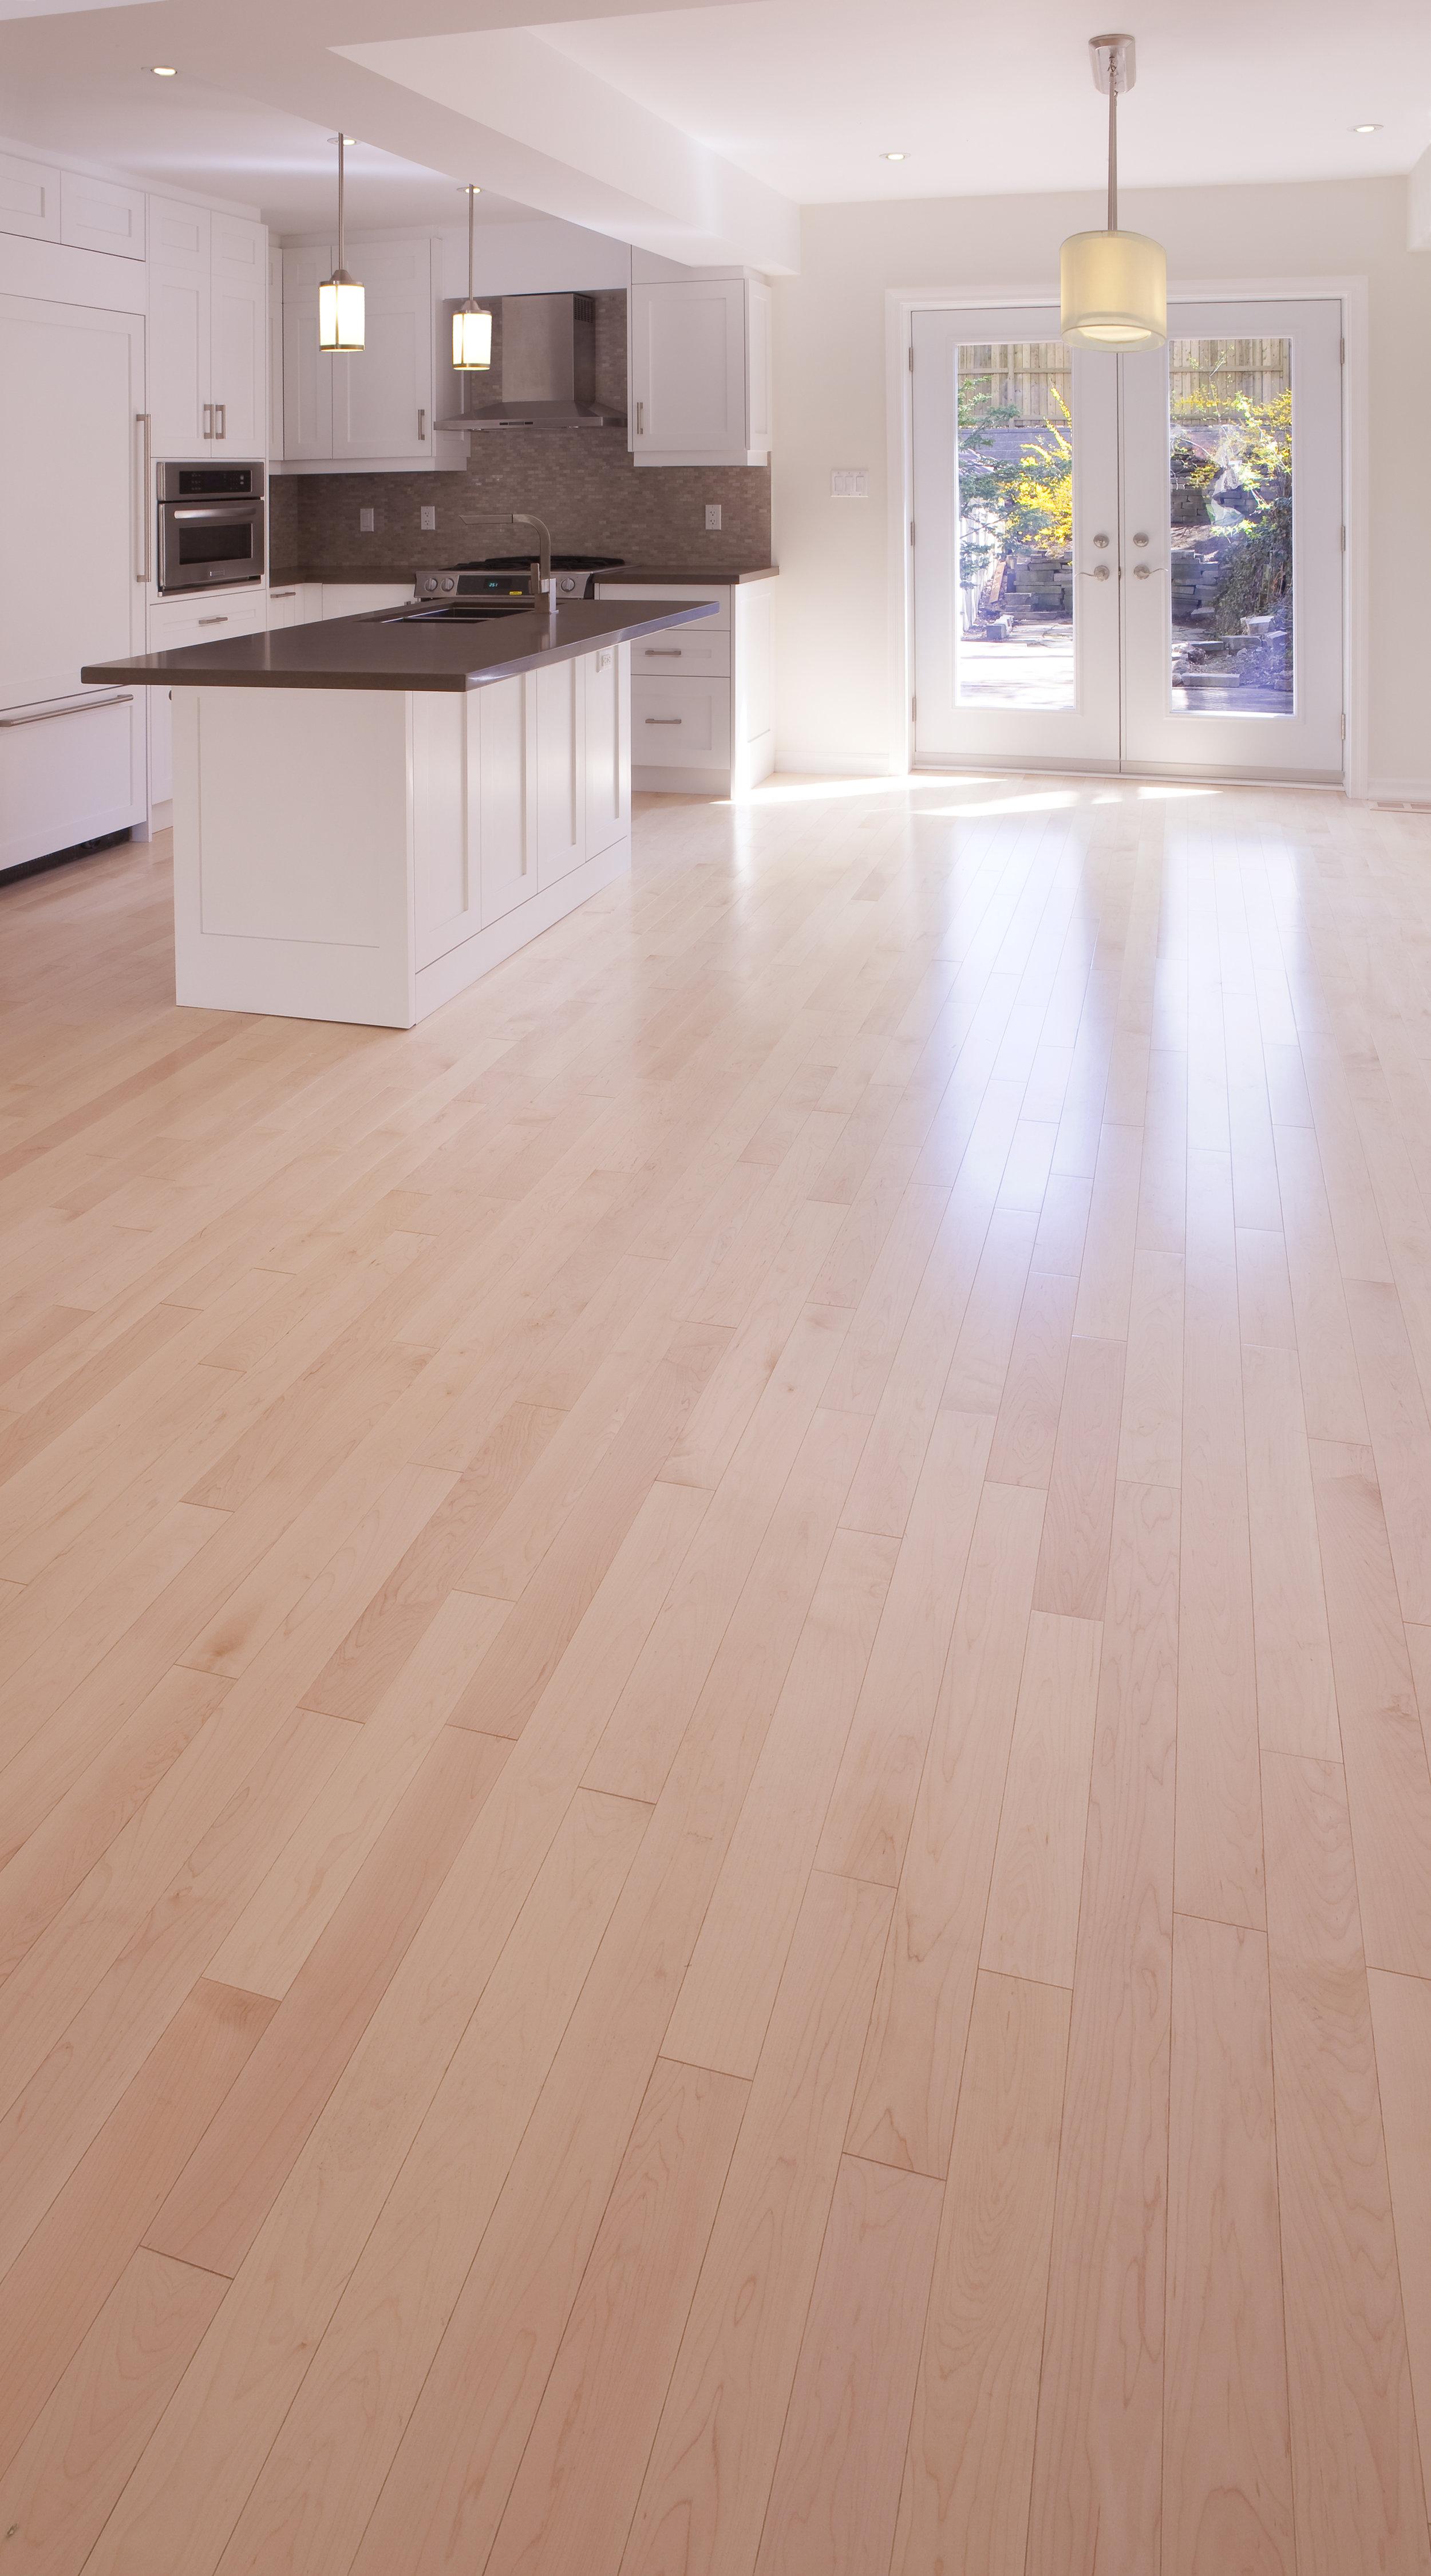 Natural Maple Boardwalk Hardwood Floors